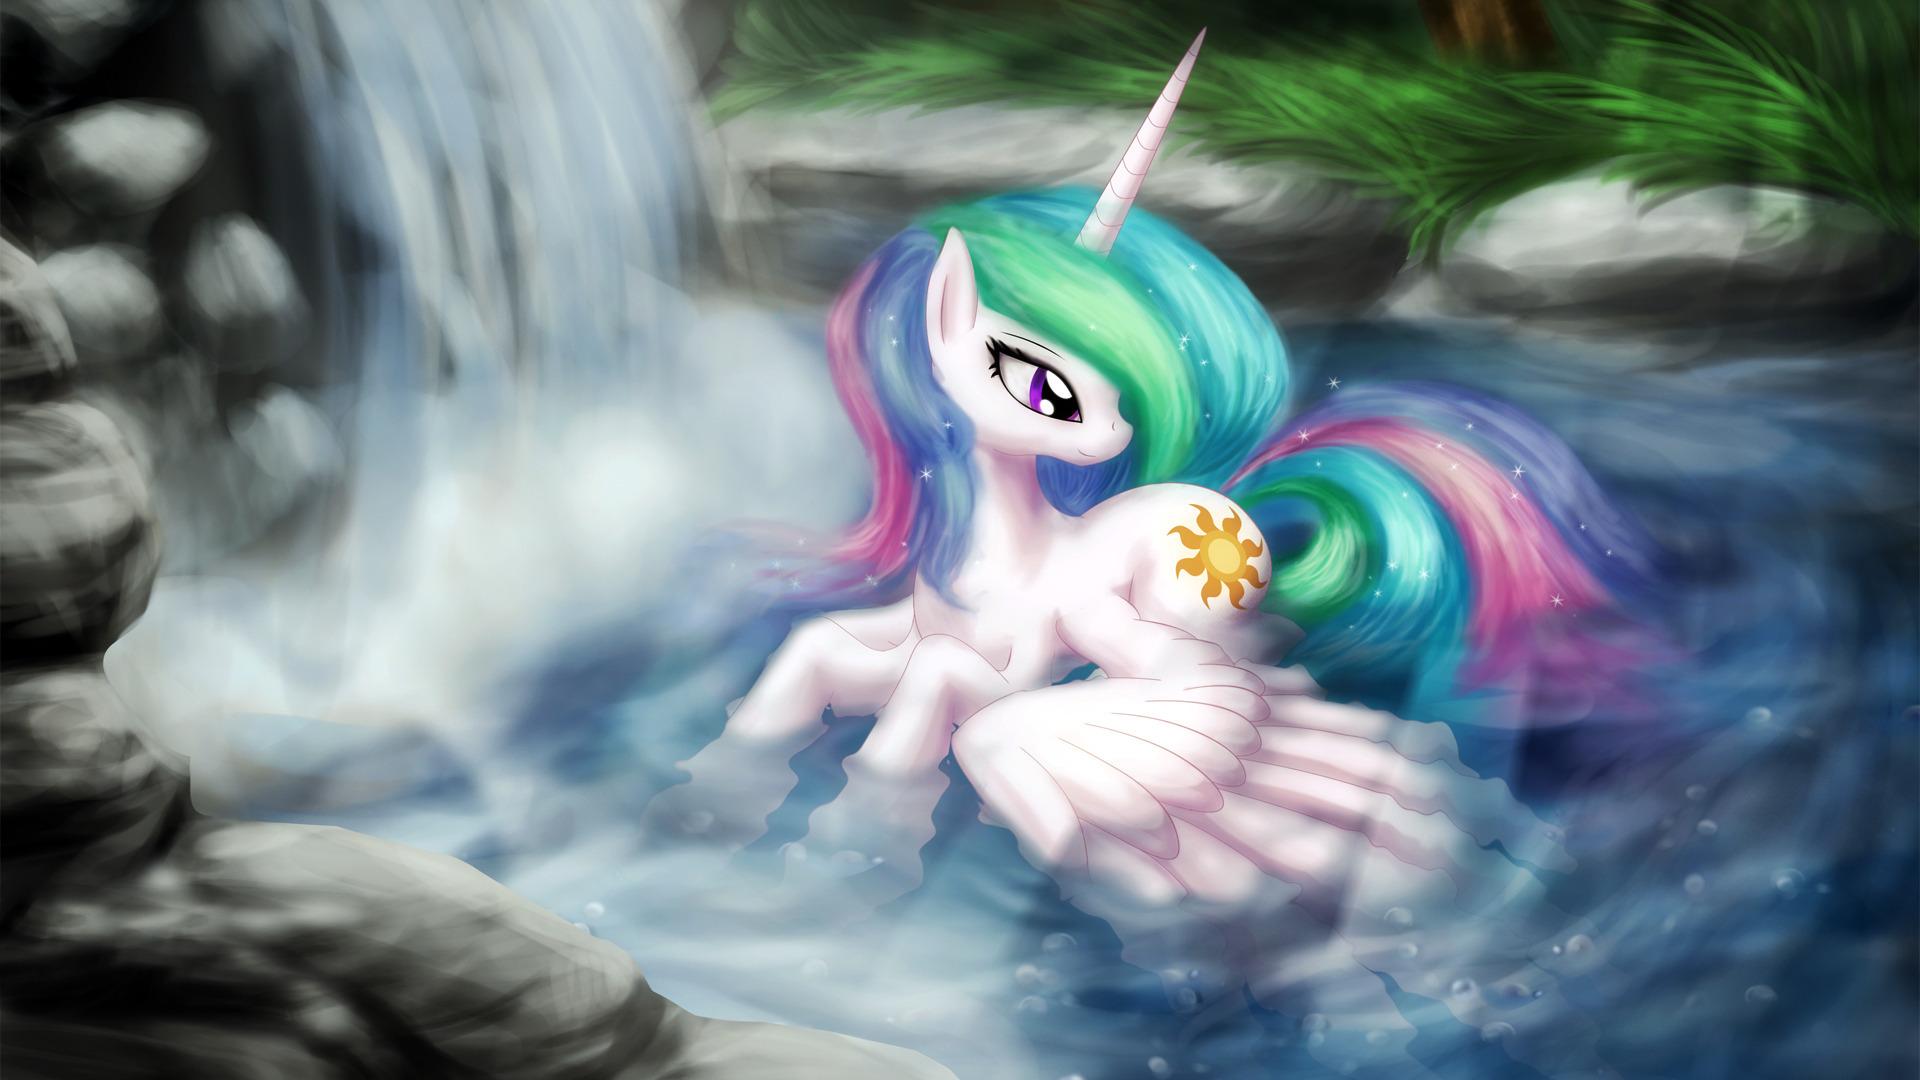 Awesome-Celestia-pics-princess-celestia-